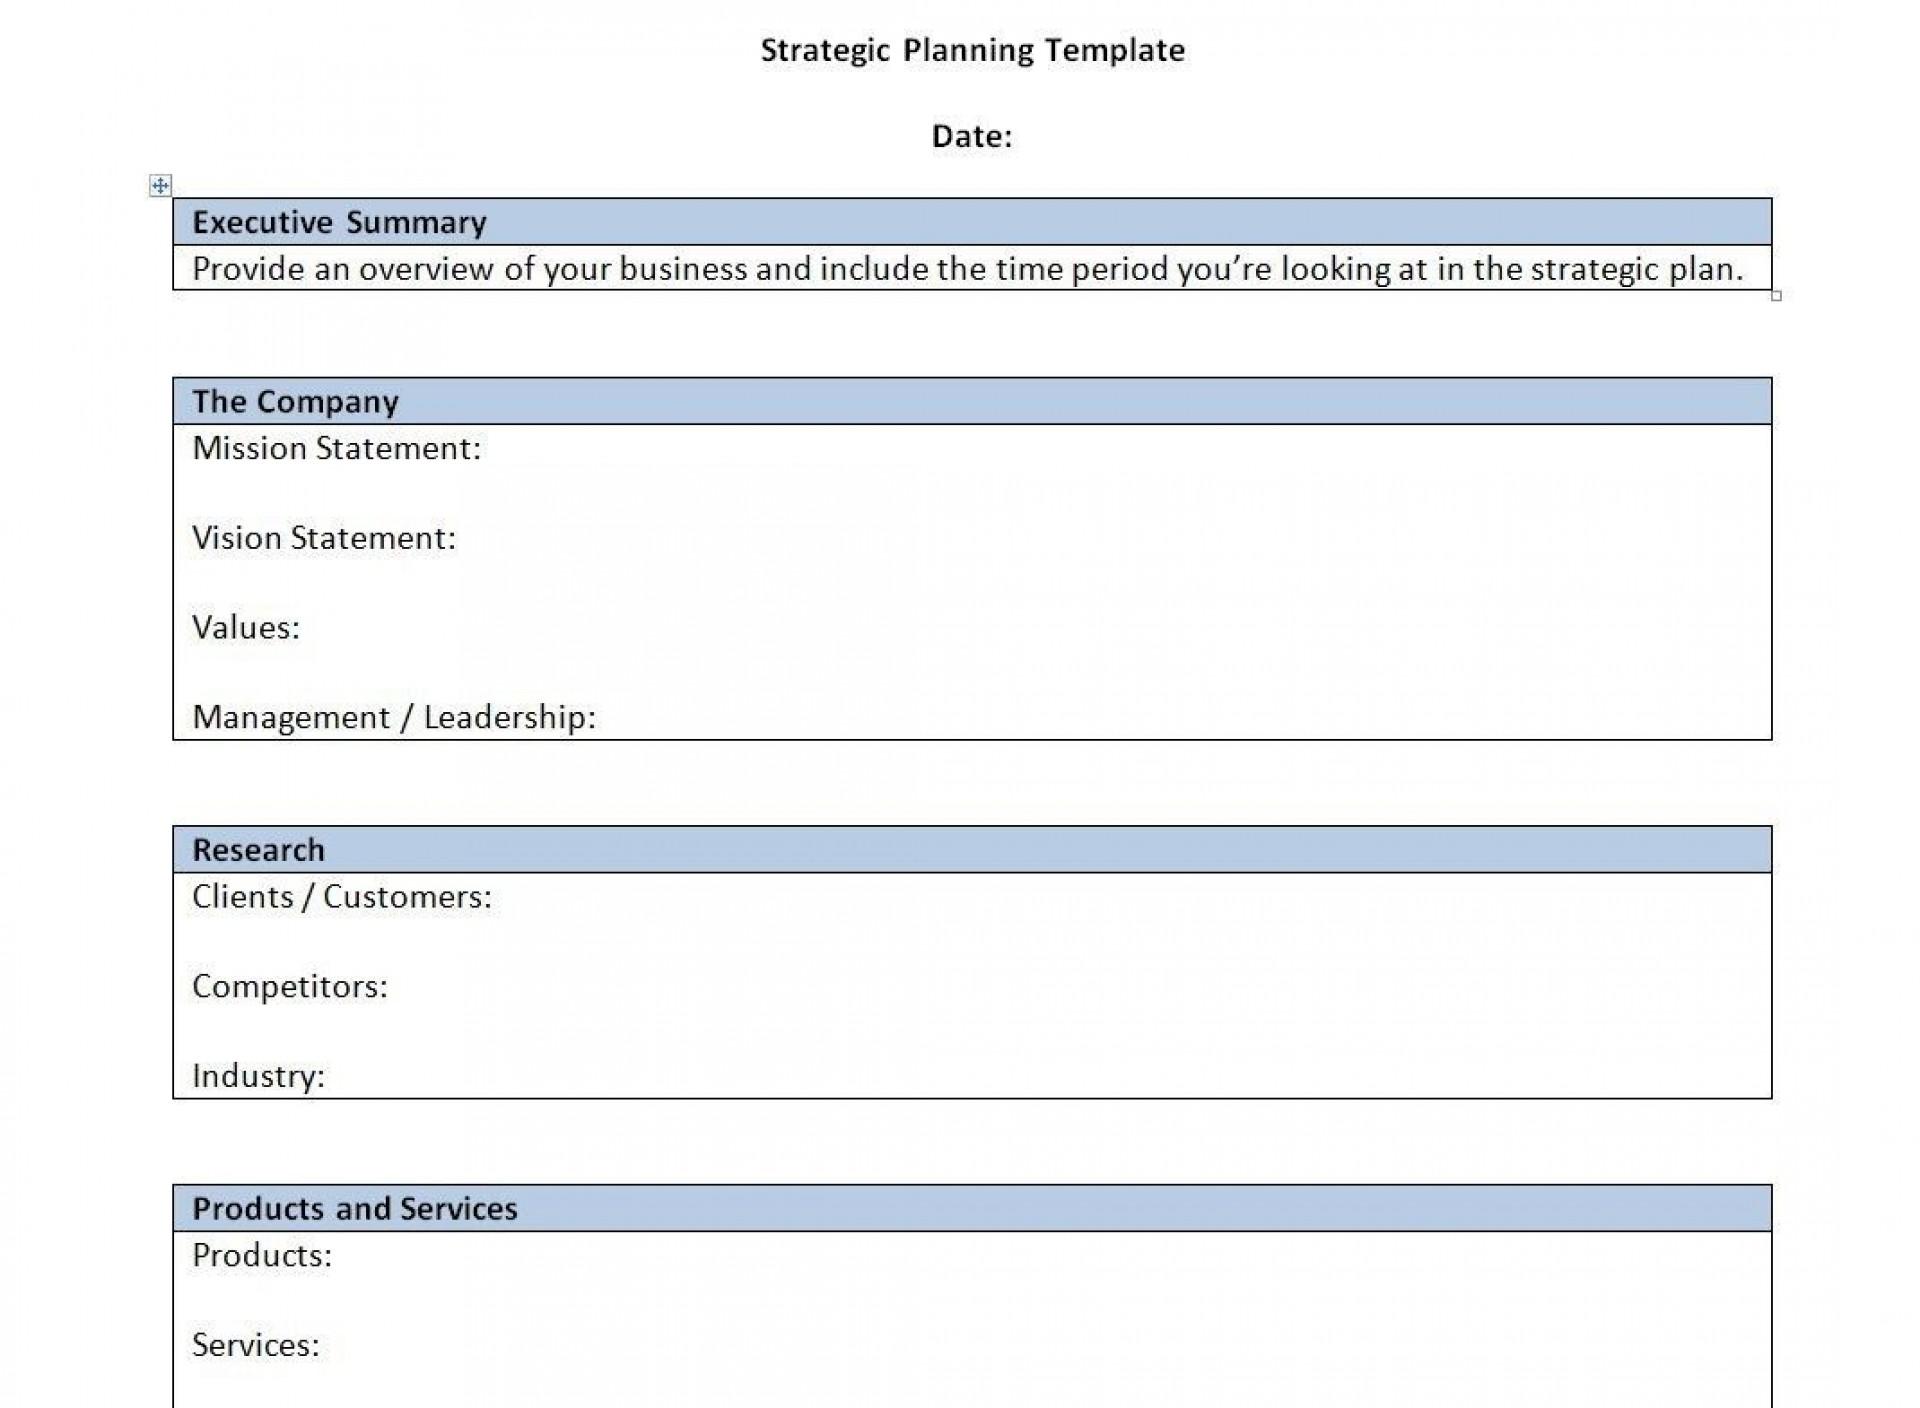 000 Singular Strategic Busines Plan Template High Resolution  Doc Word Sample1920